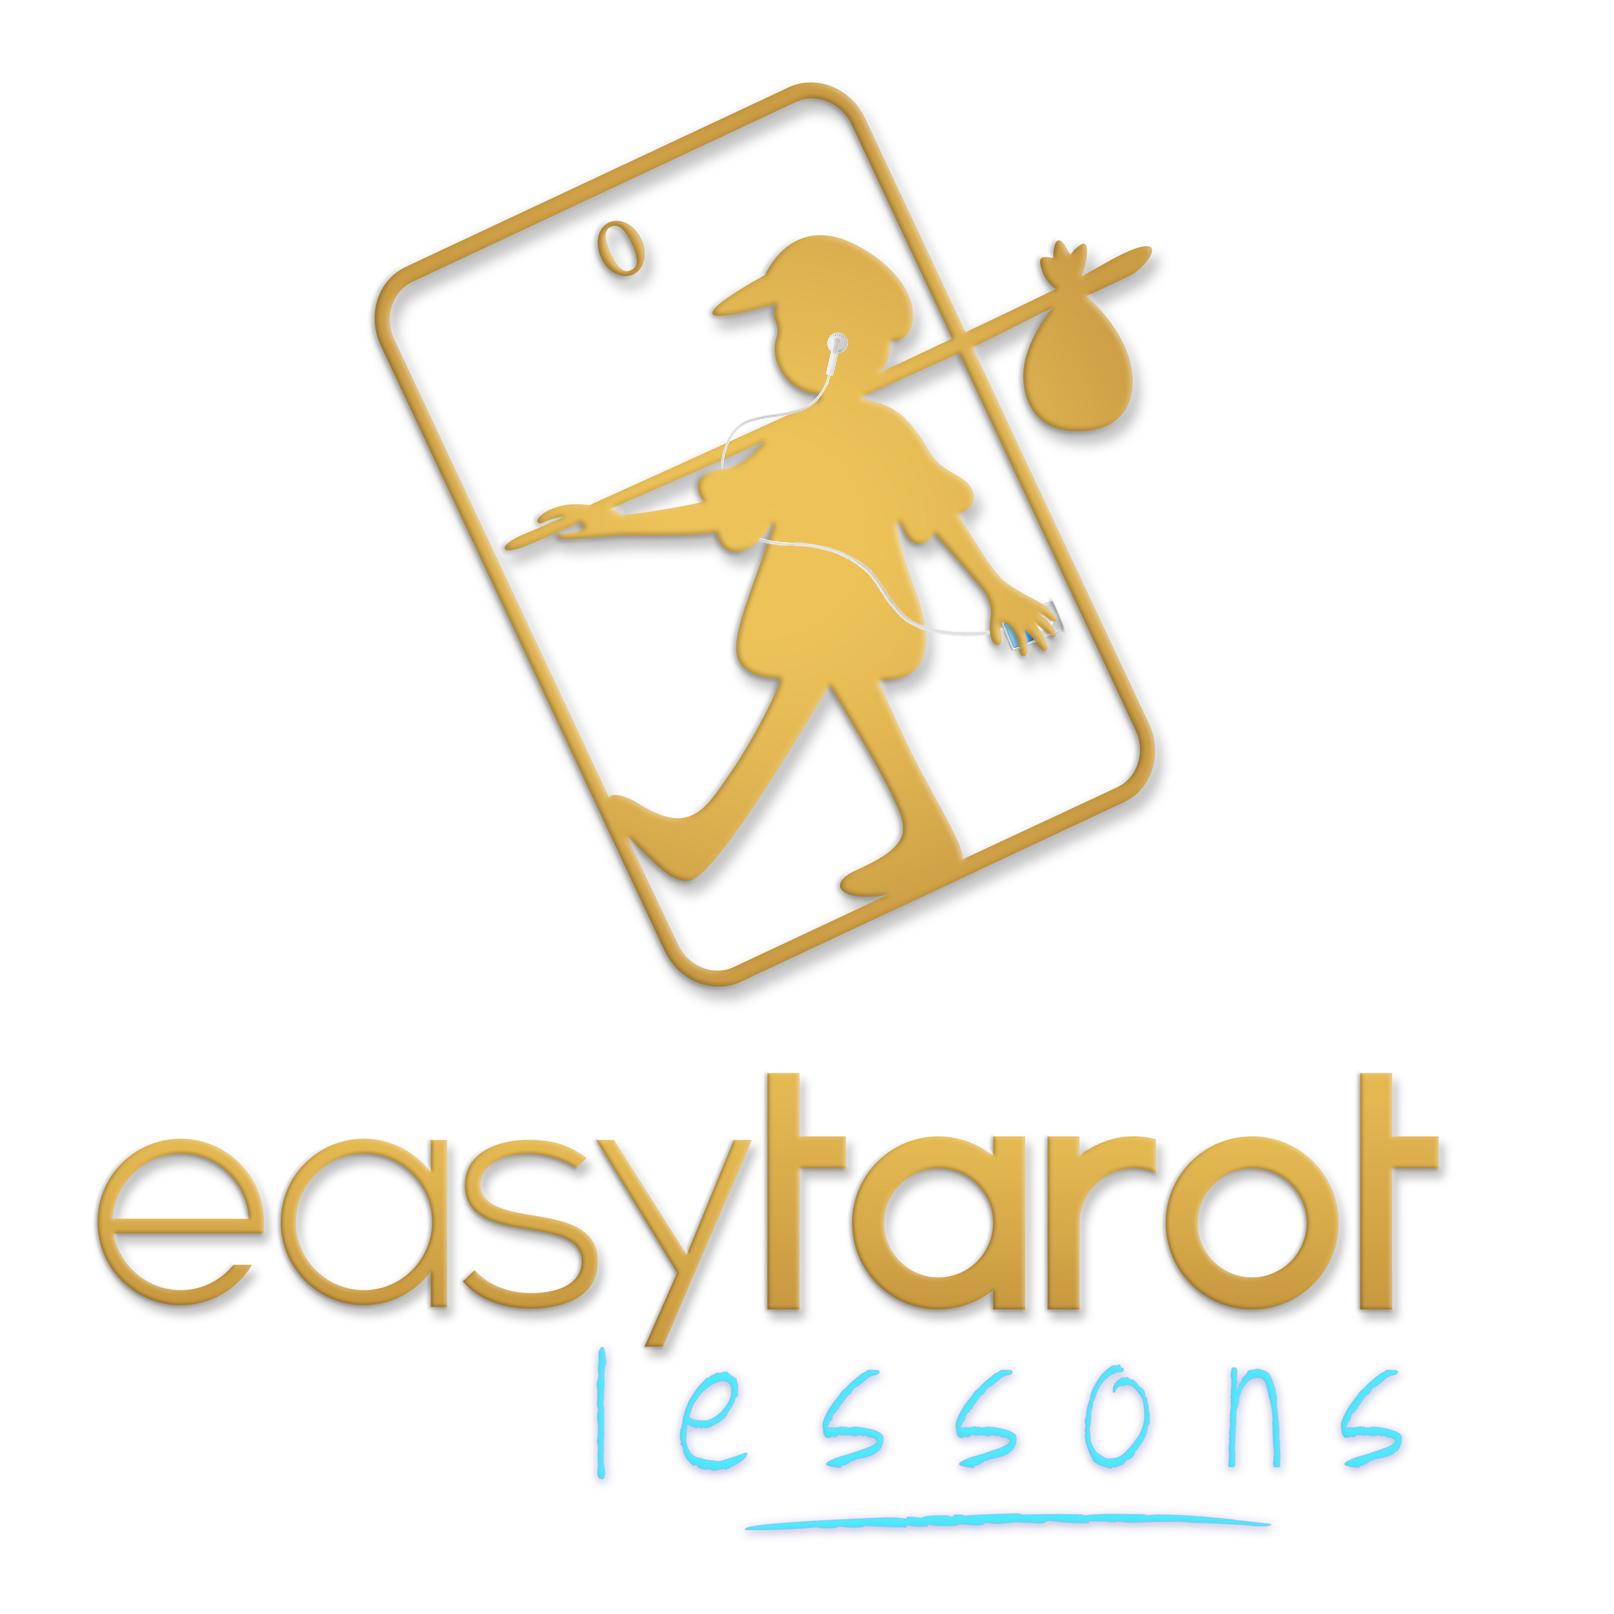 Easy Tarot Lessons! show art